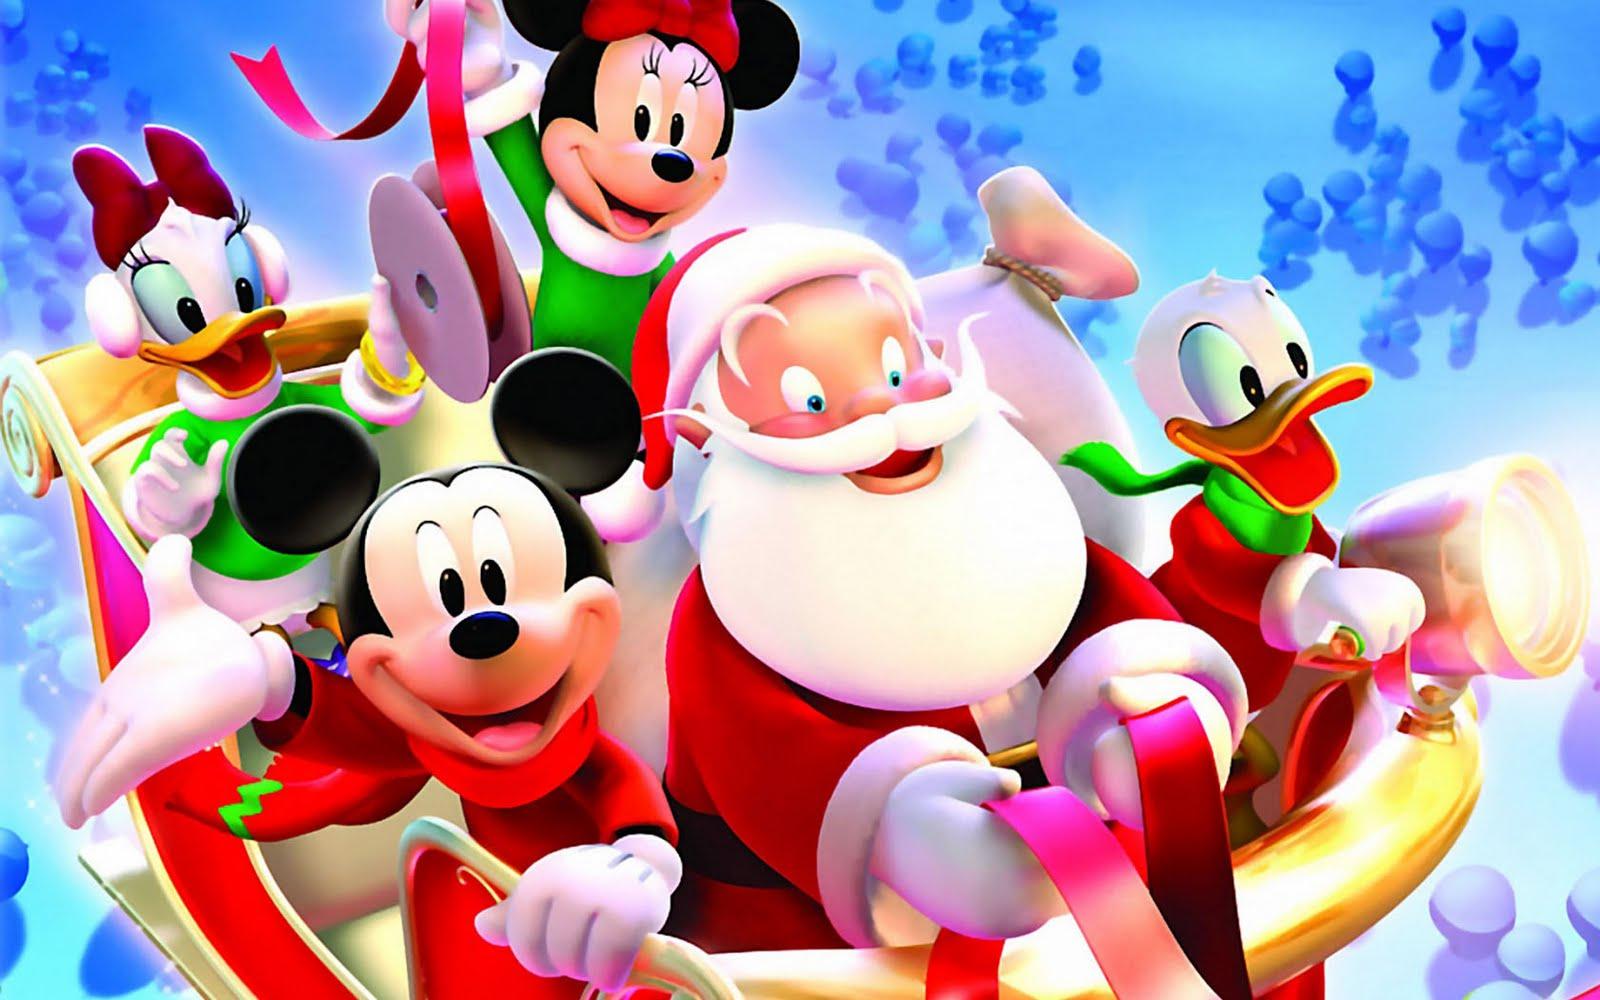 Kid at Christmas 5 adorable Disney Christmas wallpapers for your 1600x1000